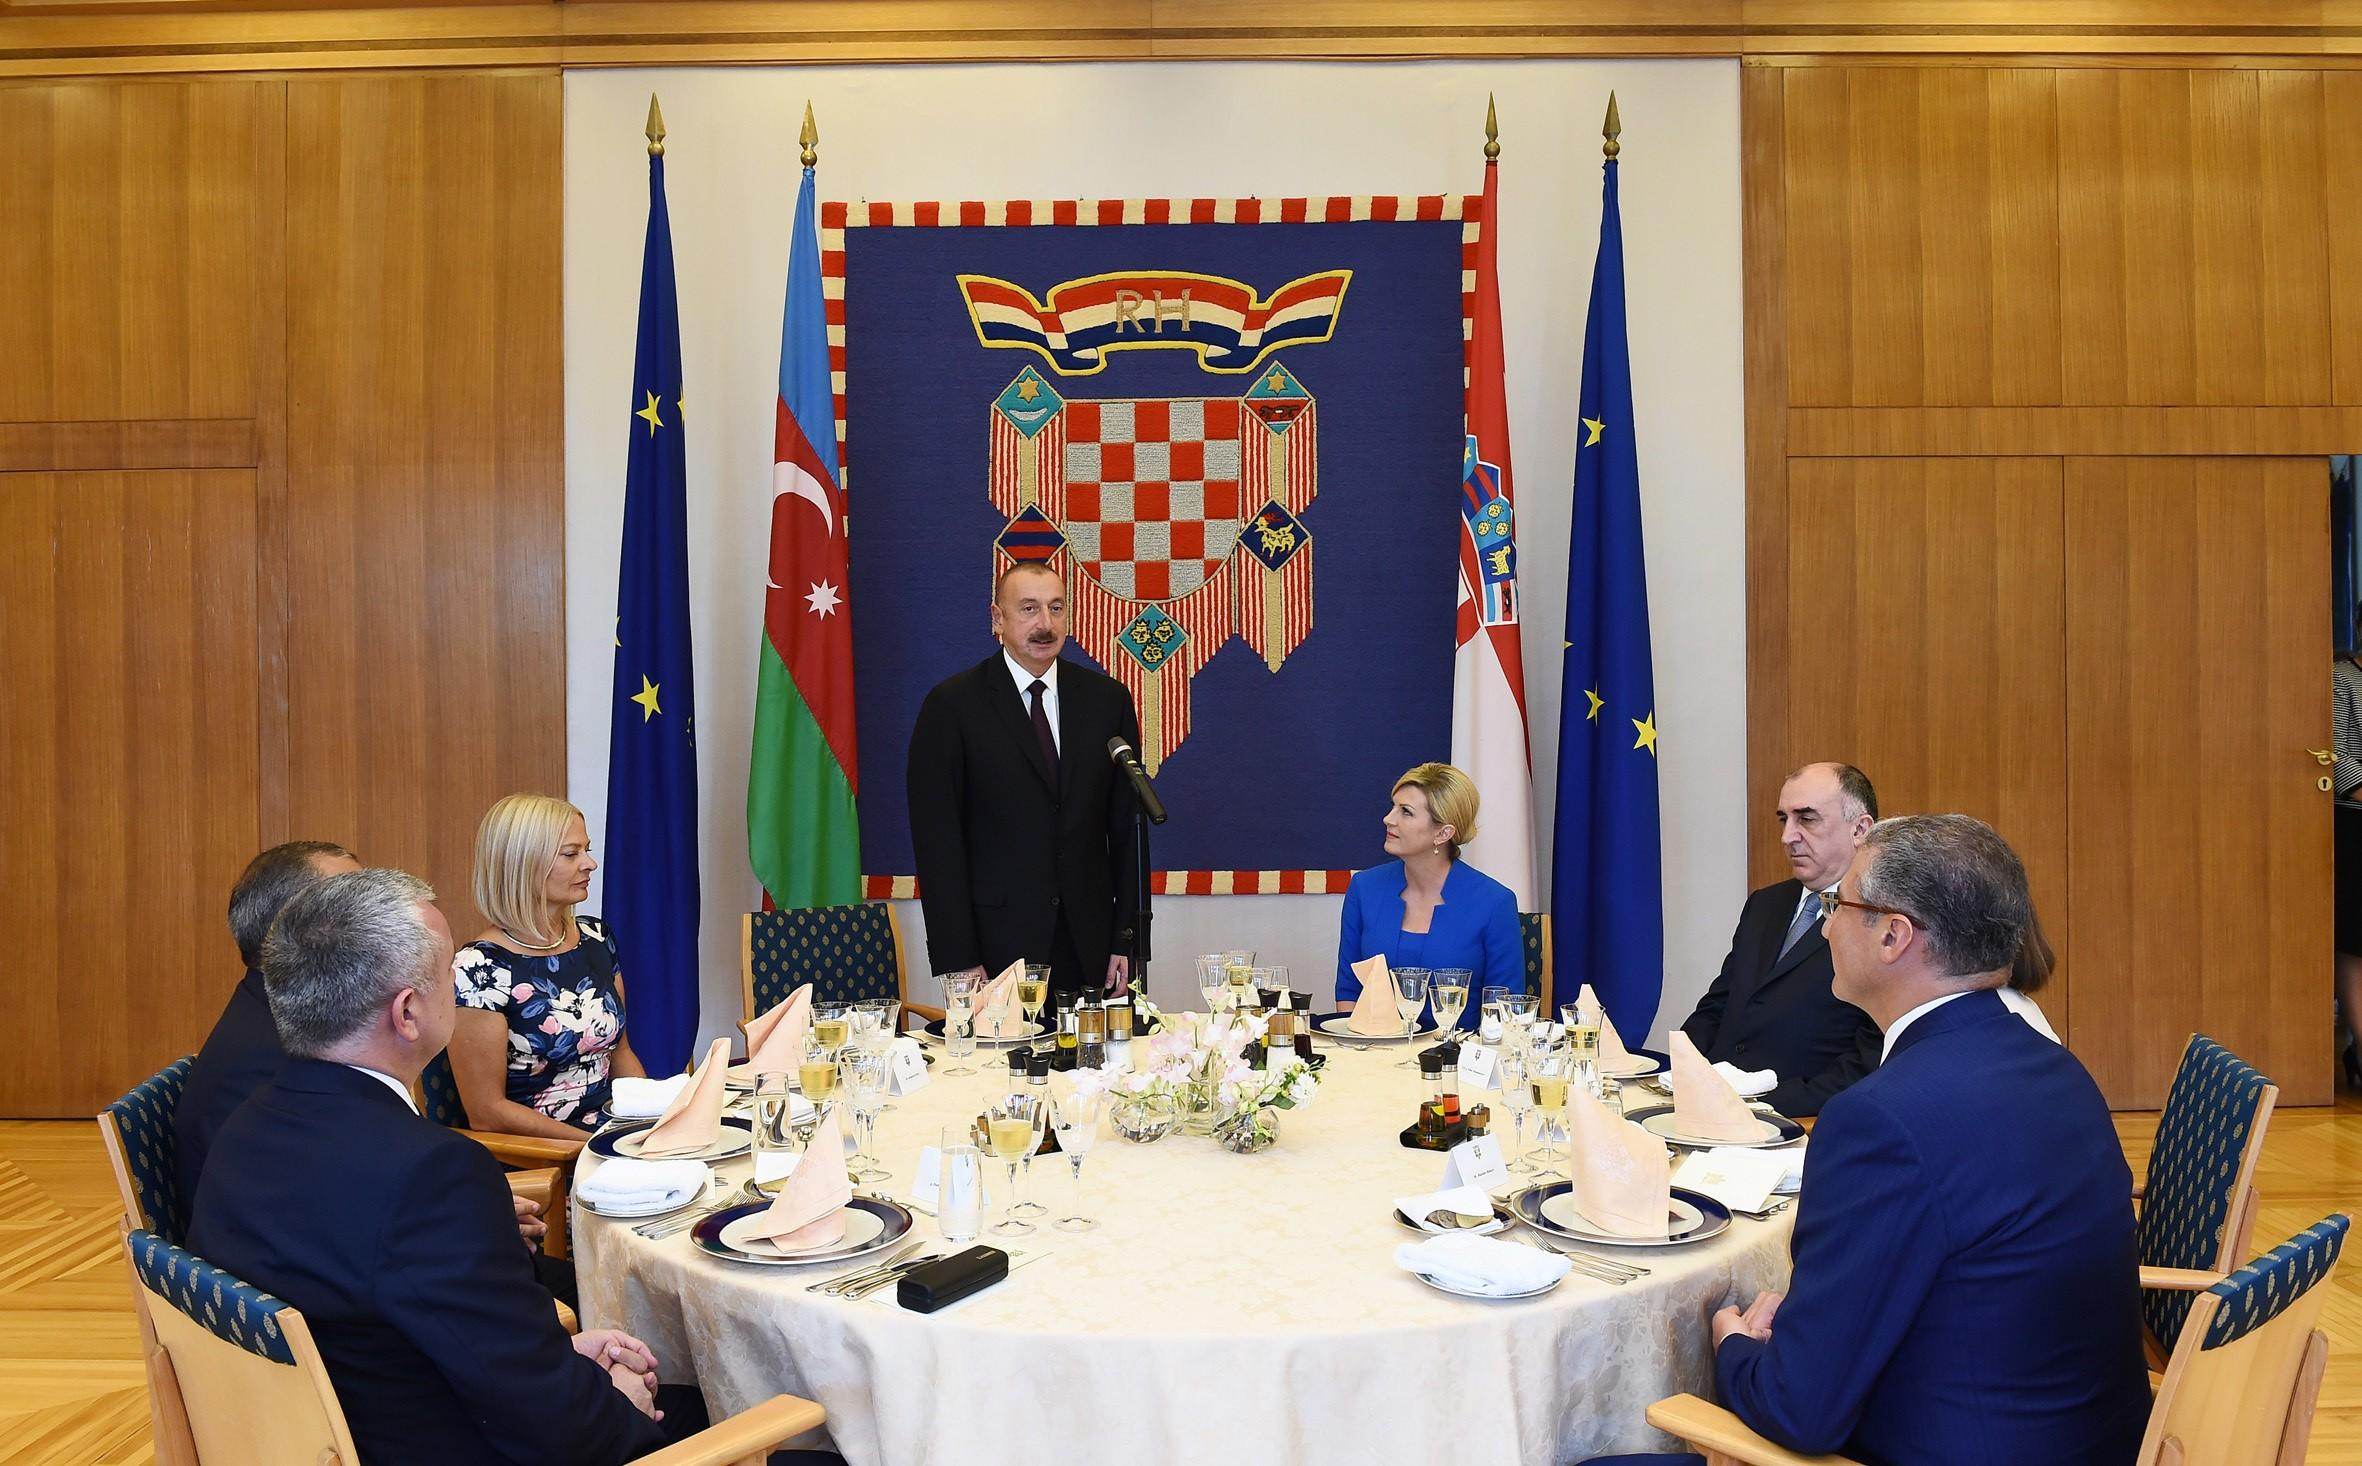 Ильхам Алиев пригласил президента Хорватии совершить визит в Азербайджан